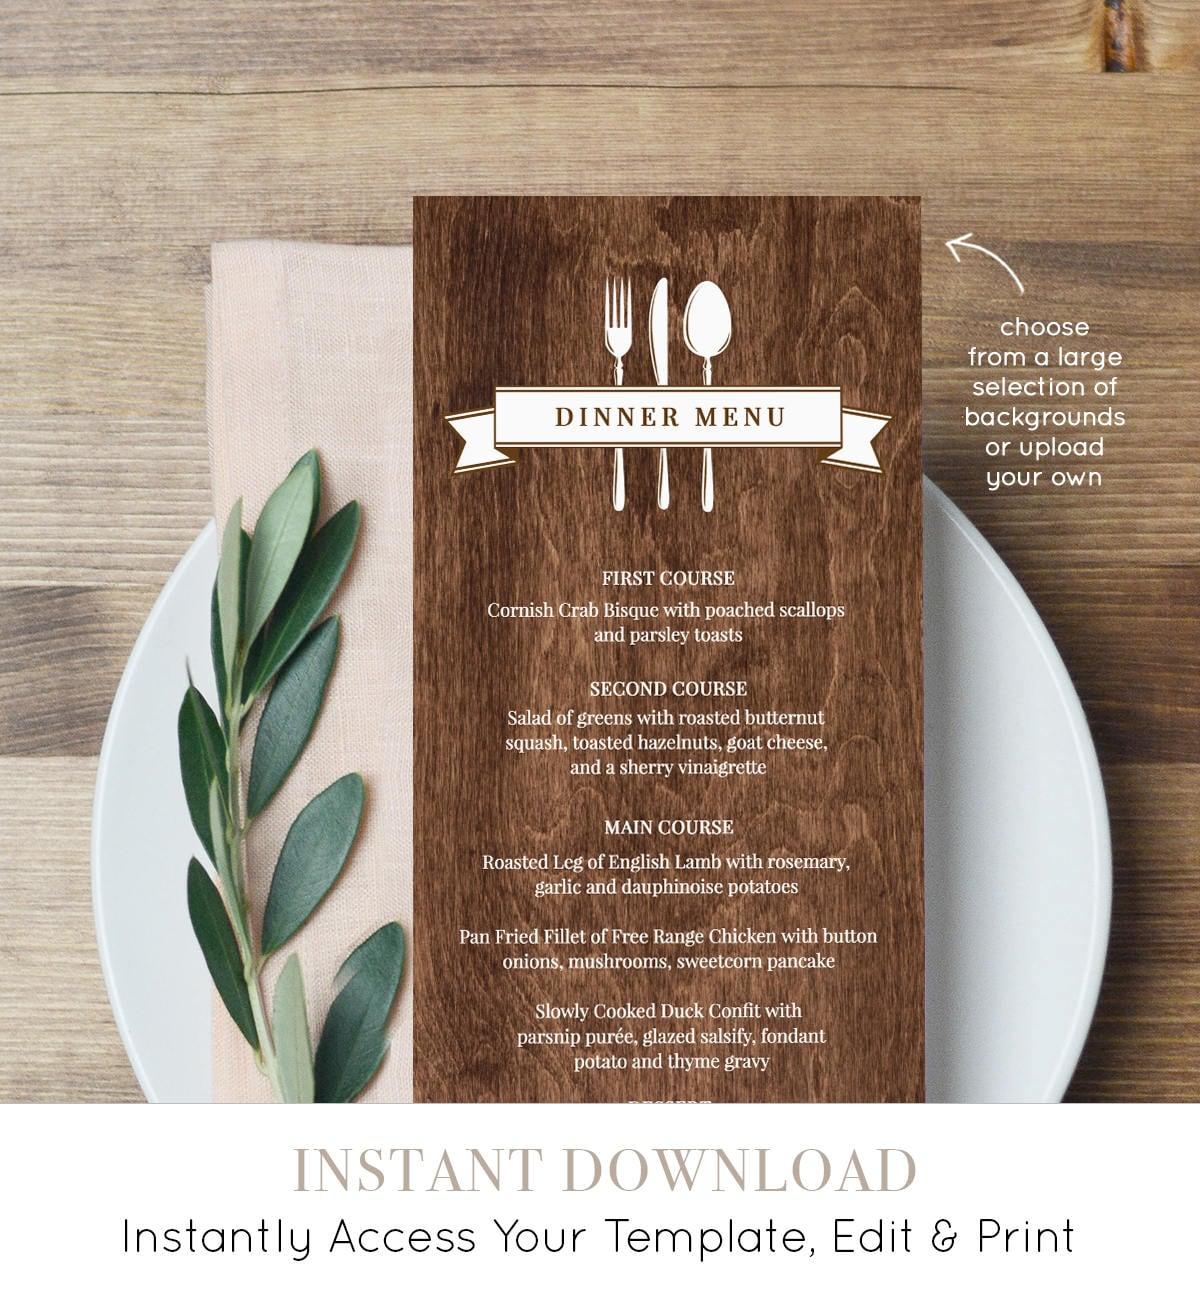 Simply Editable PDF Instant Download Melia: Printable 4x9.25 Dinner Menu Template in Black Calligraphy Wedding Menu Minimalist Menu